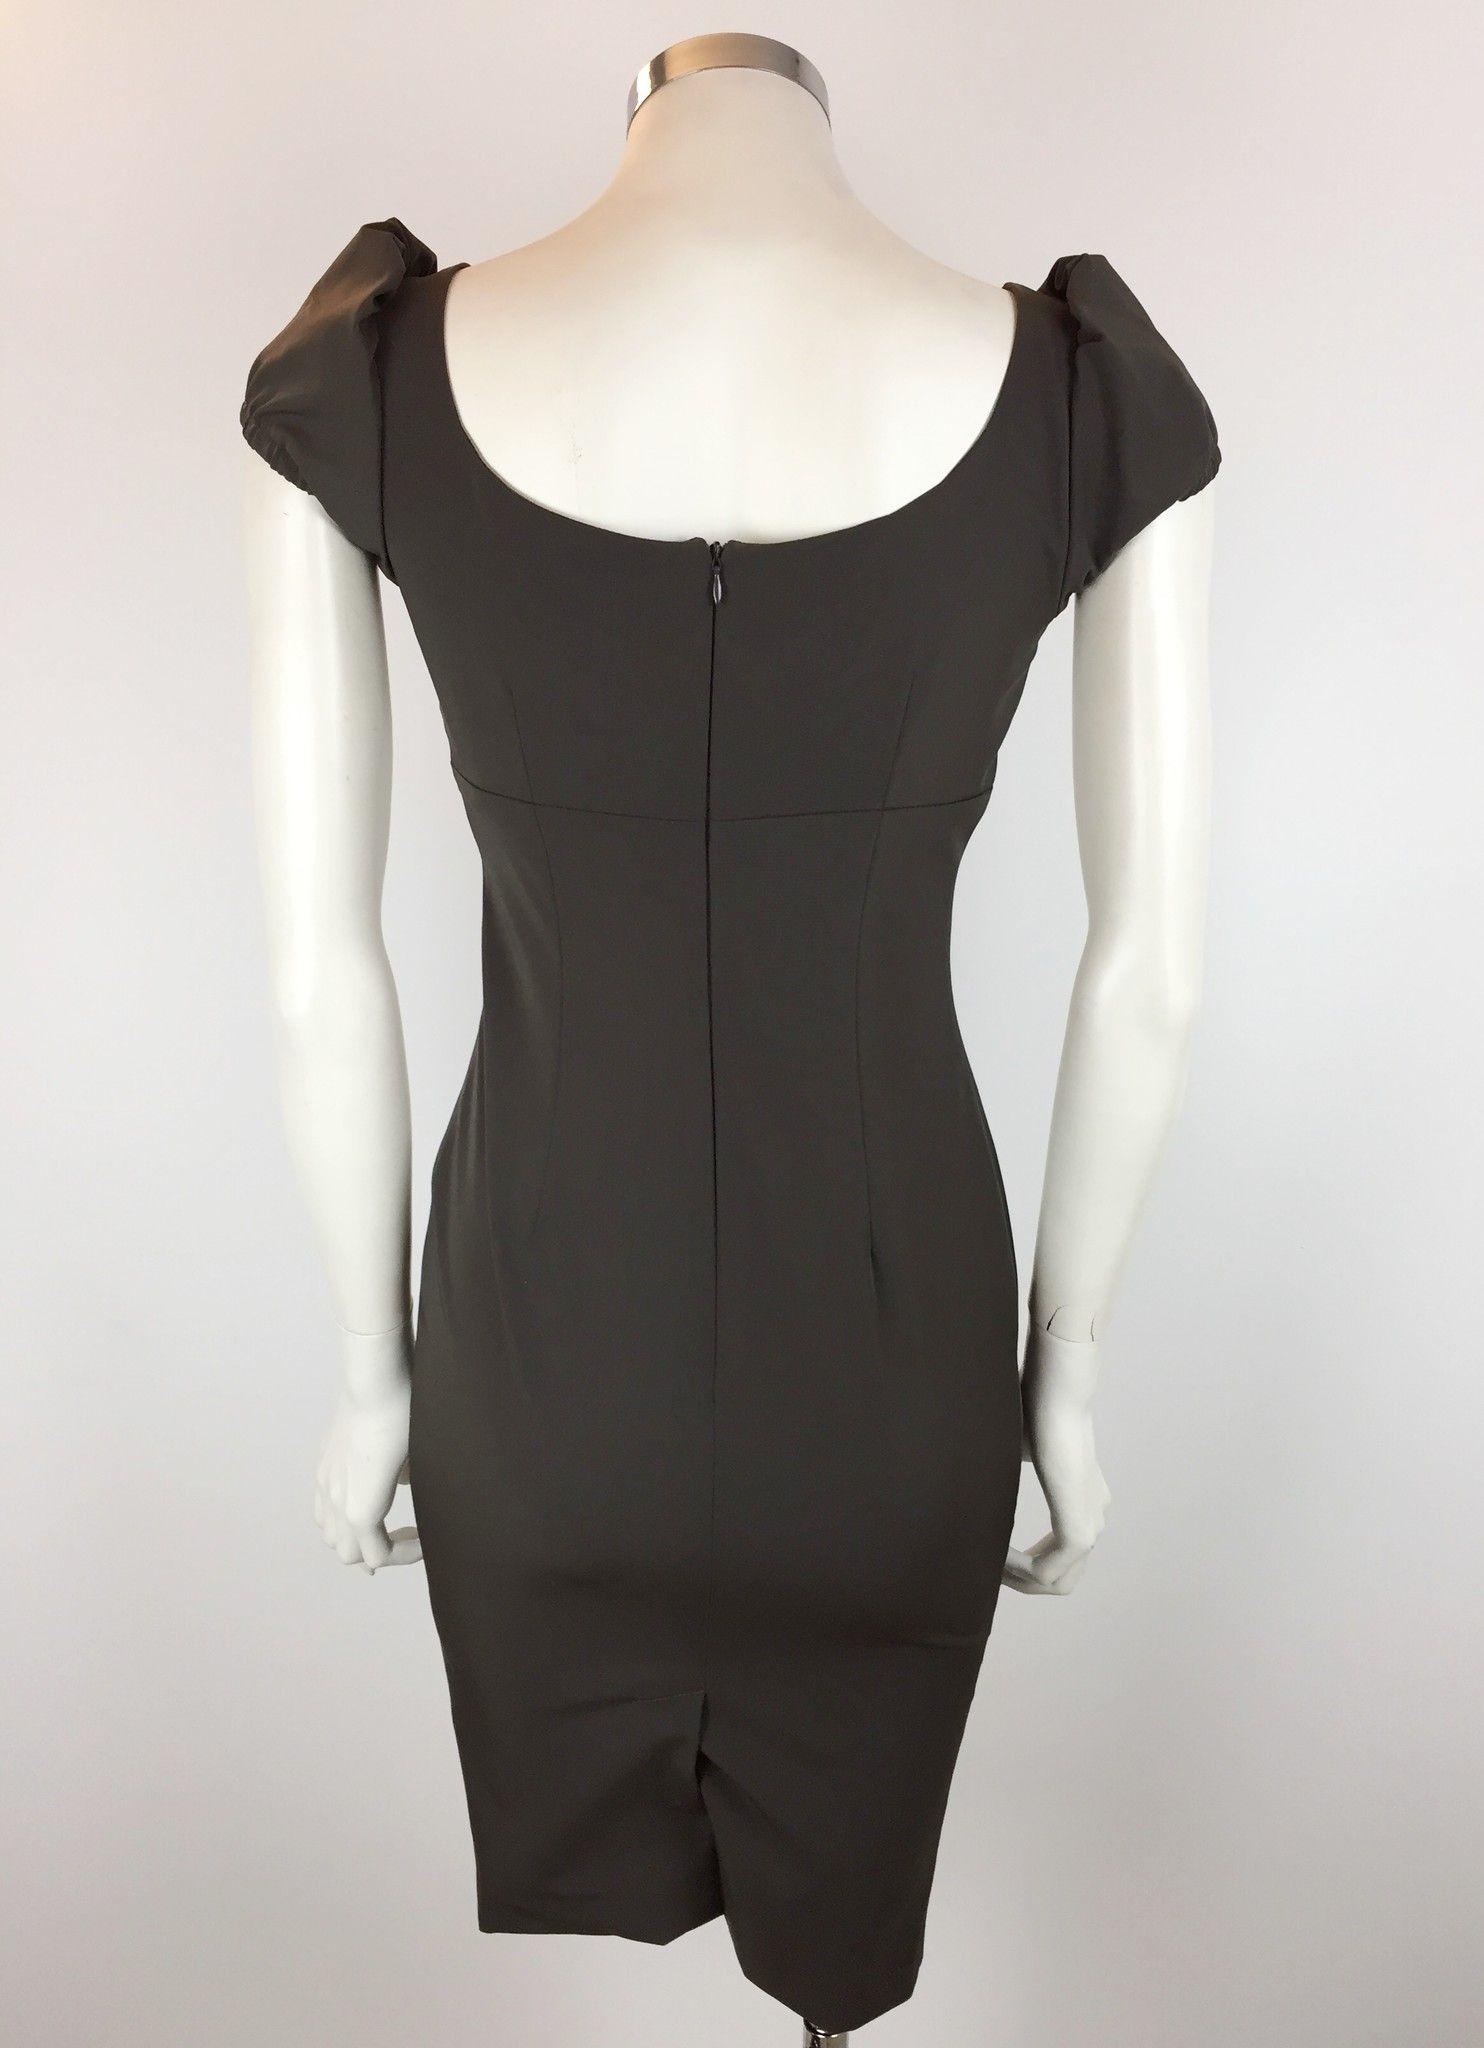 Mary Depp Round Neck Dress Cod.30193